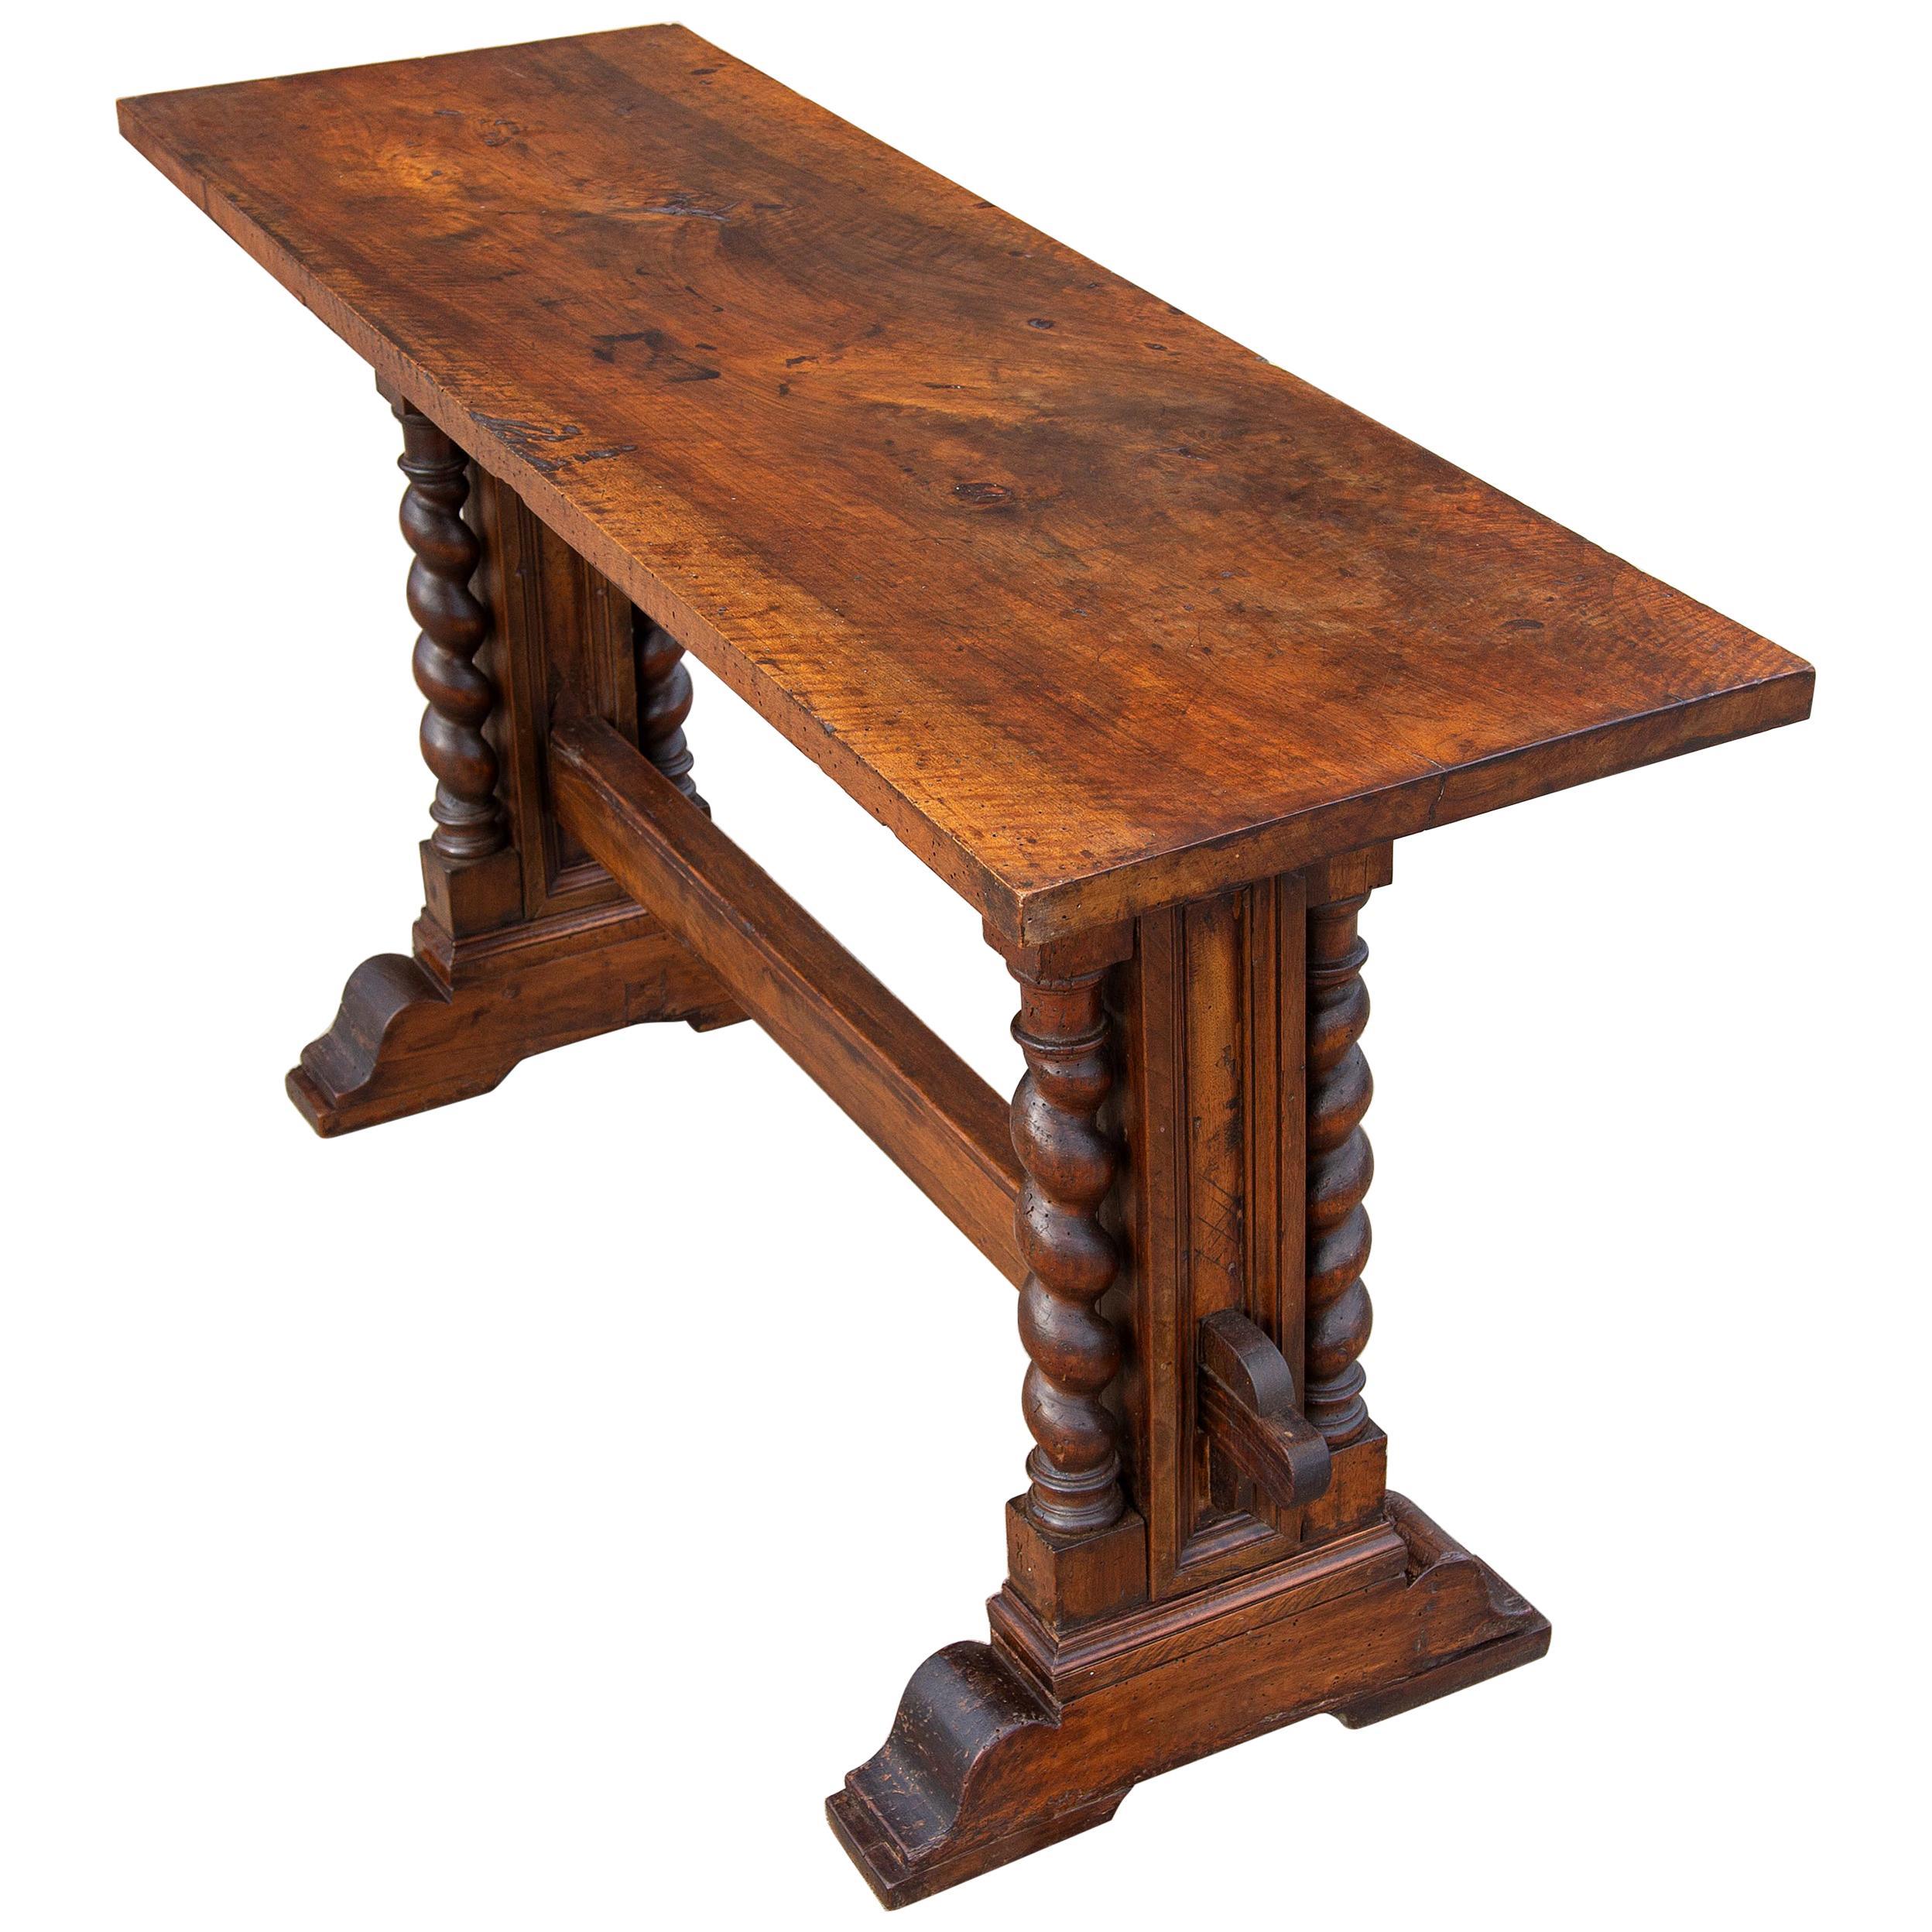 Italian Baroque Walnut Trestle Sofa or Console Table